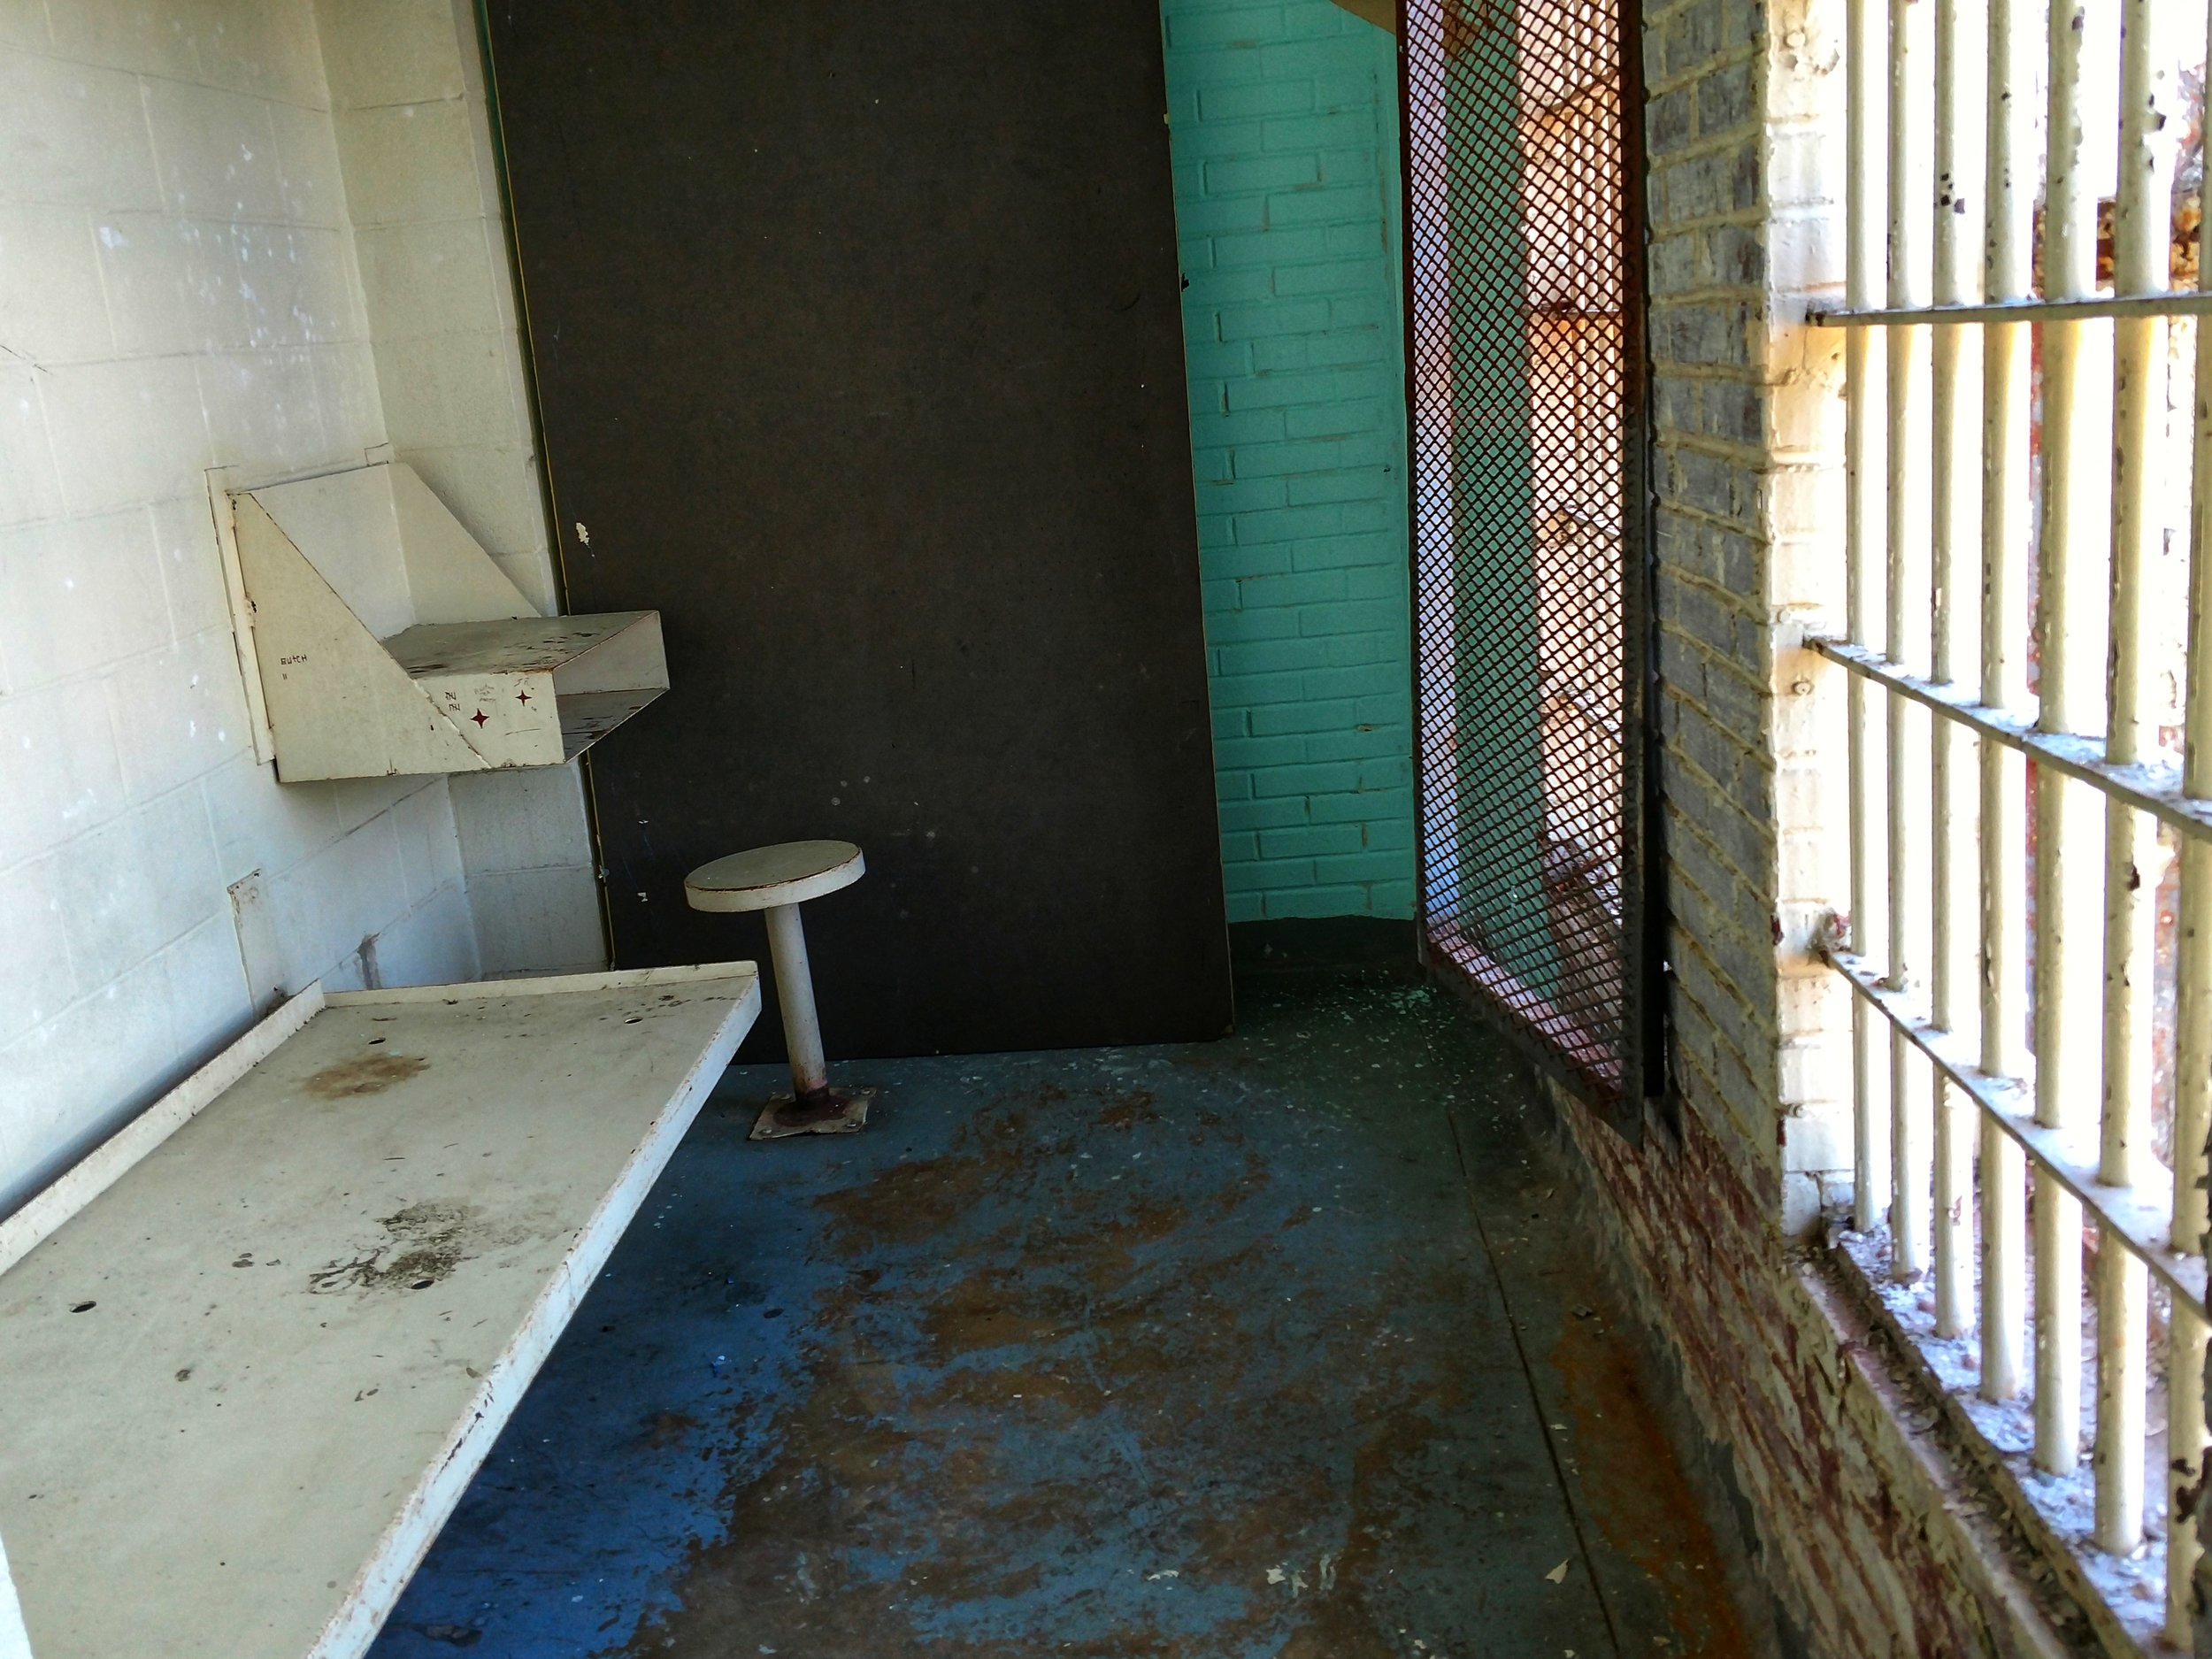 Anderson County Jail 6.jpeg